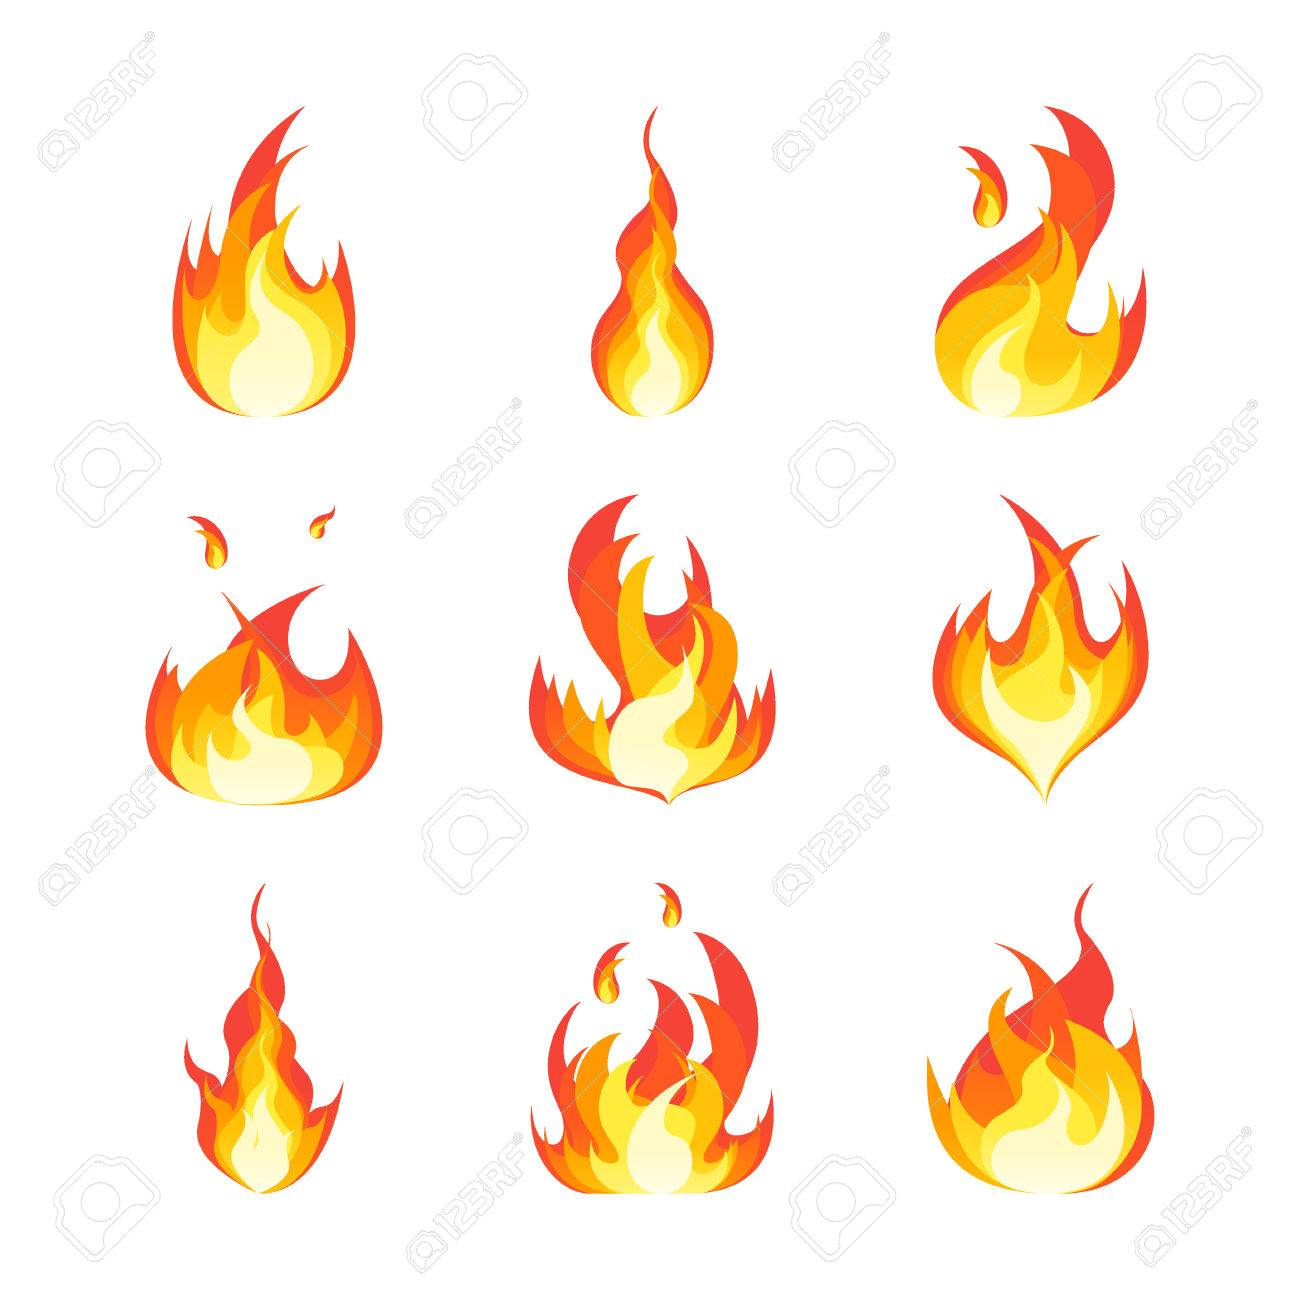 Ensemble De Flammes De Feu De Dessin Anime Clip Art Libres De